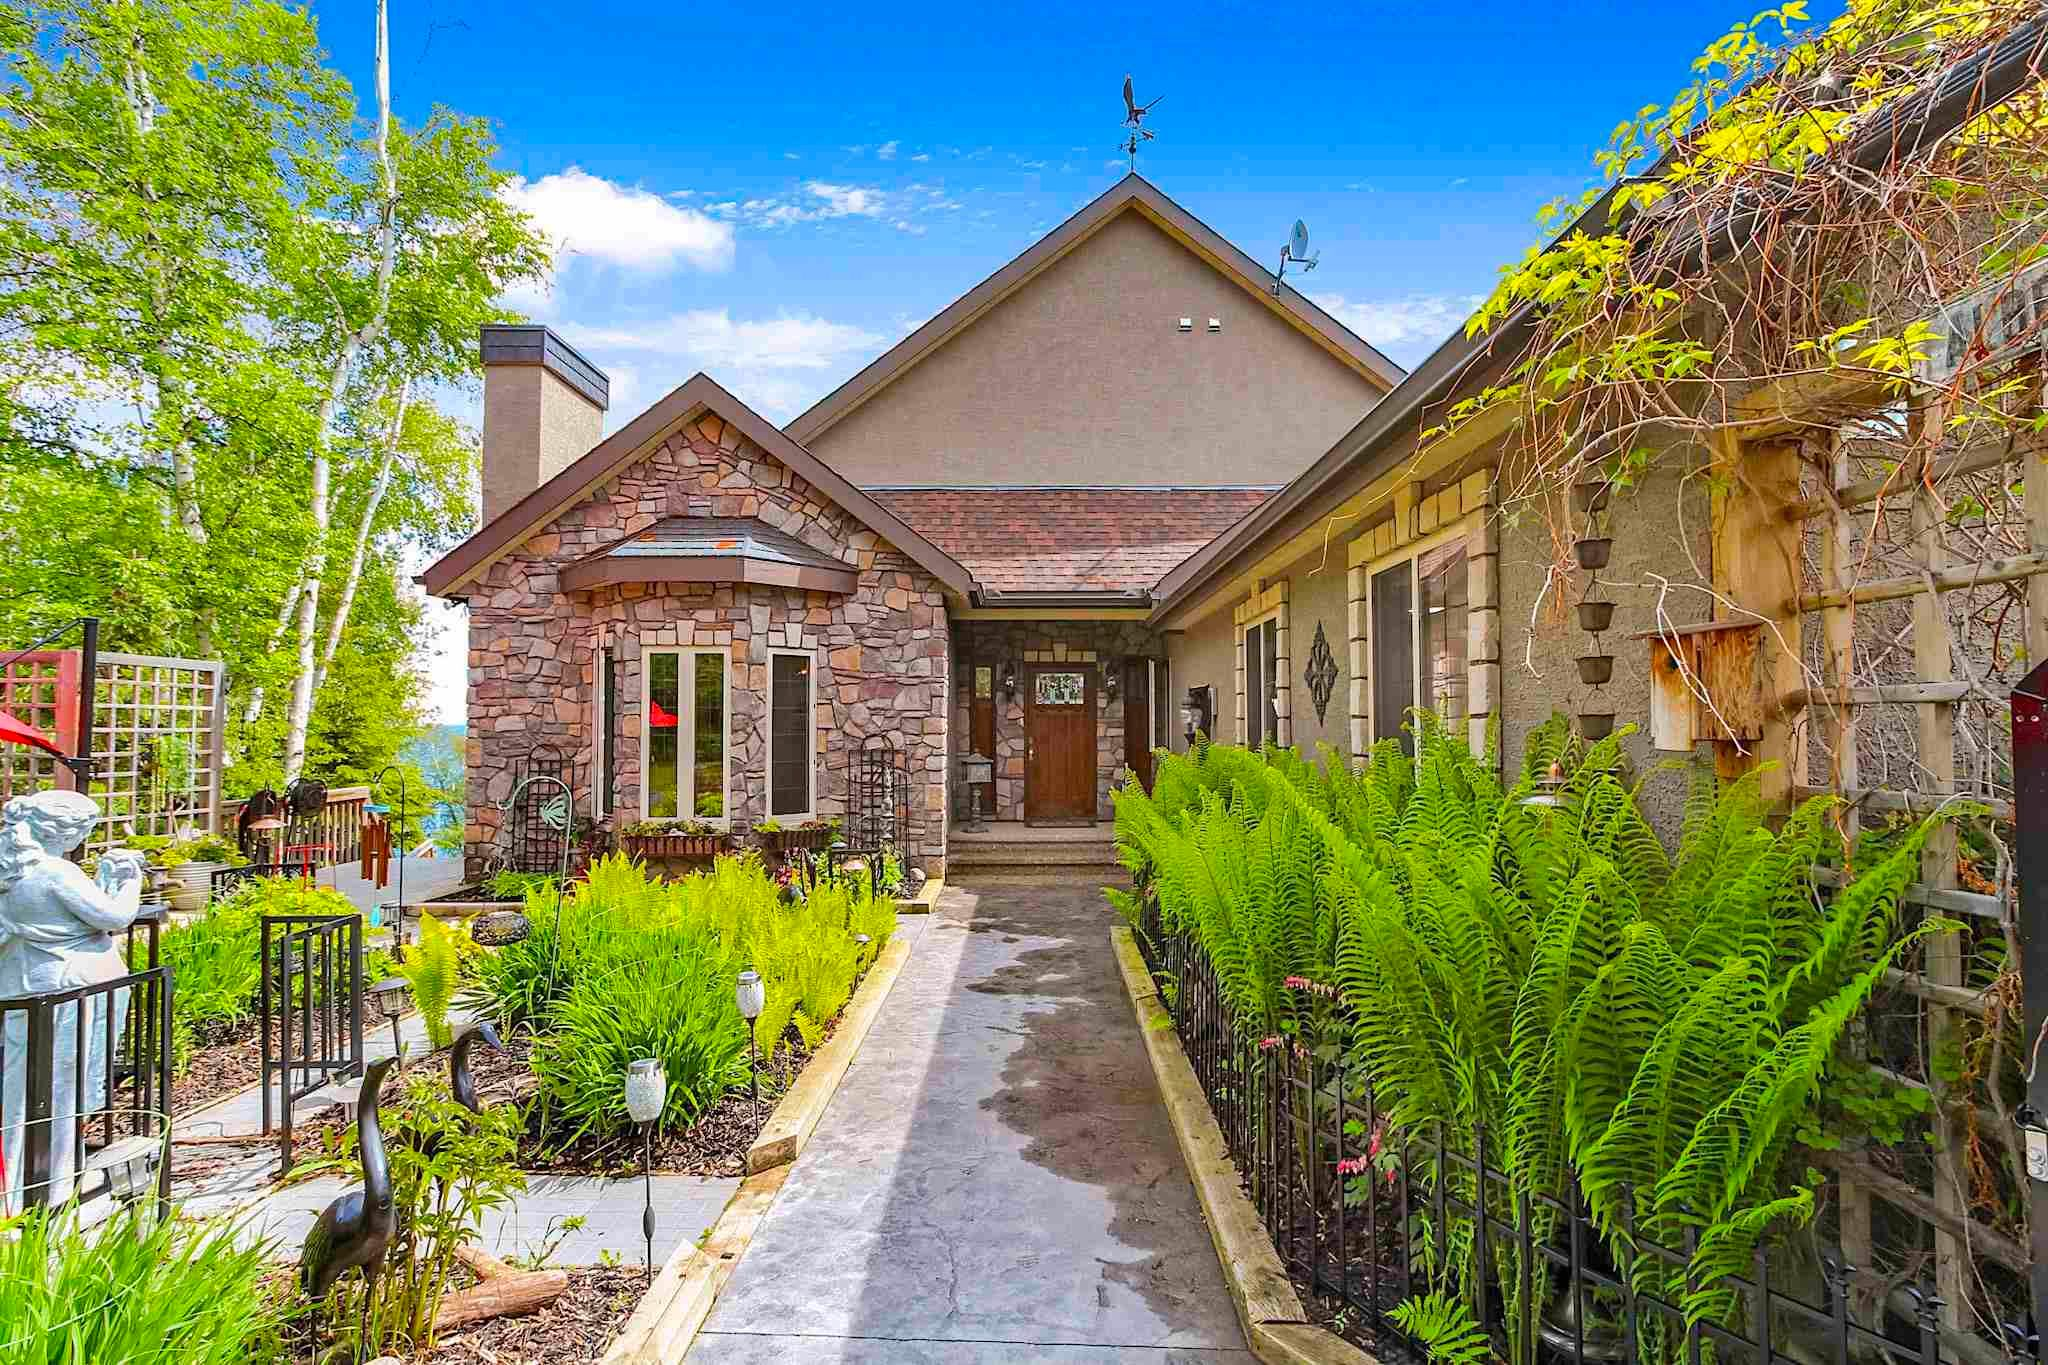 Main Photo: 301 - 42208 TWP 650: Rural Bonnyville M.D. House for sale : MLS®# E4250714